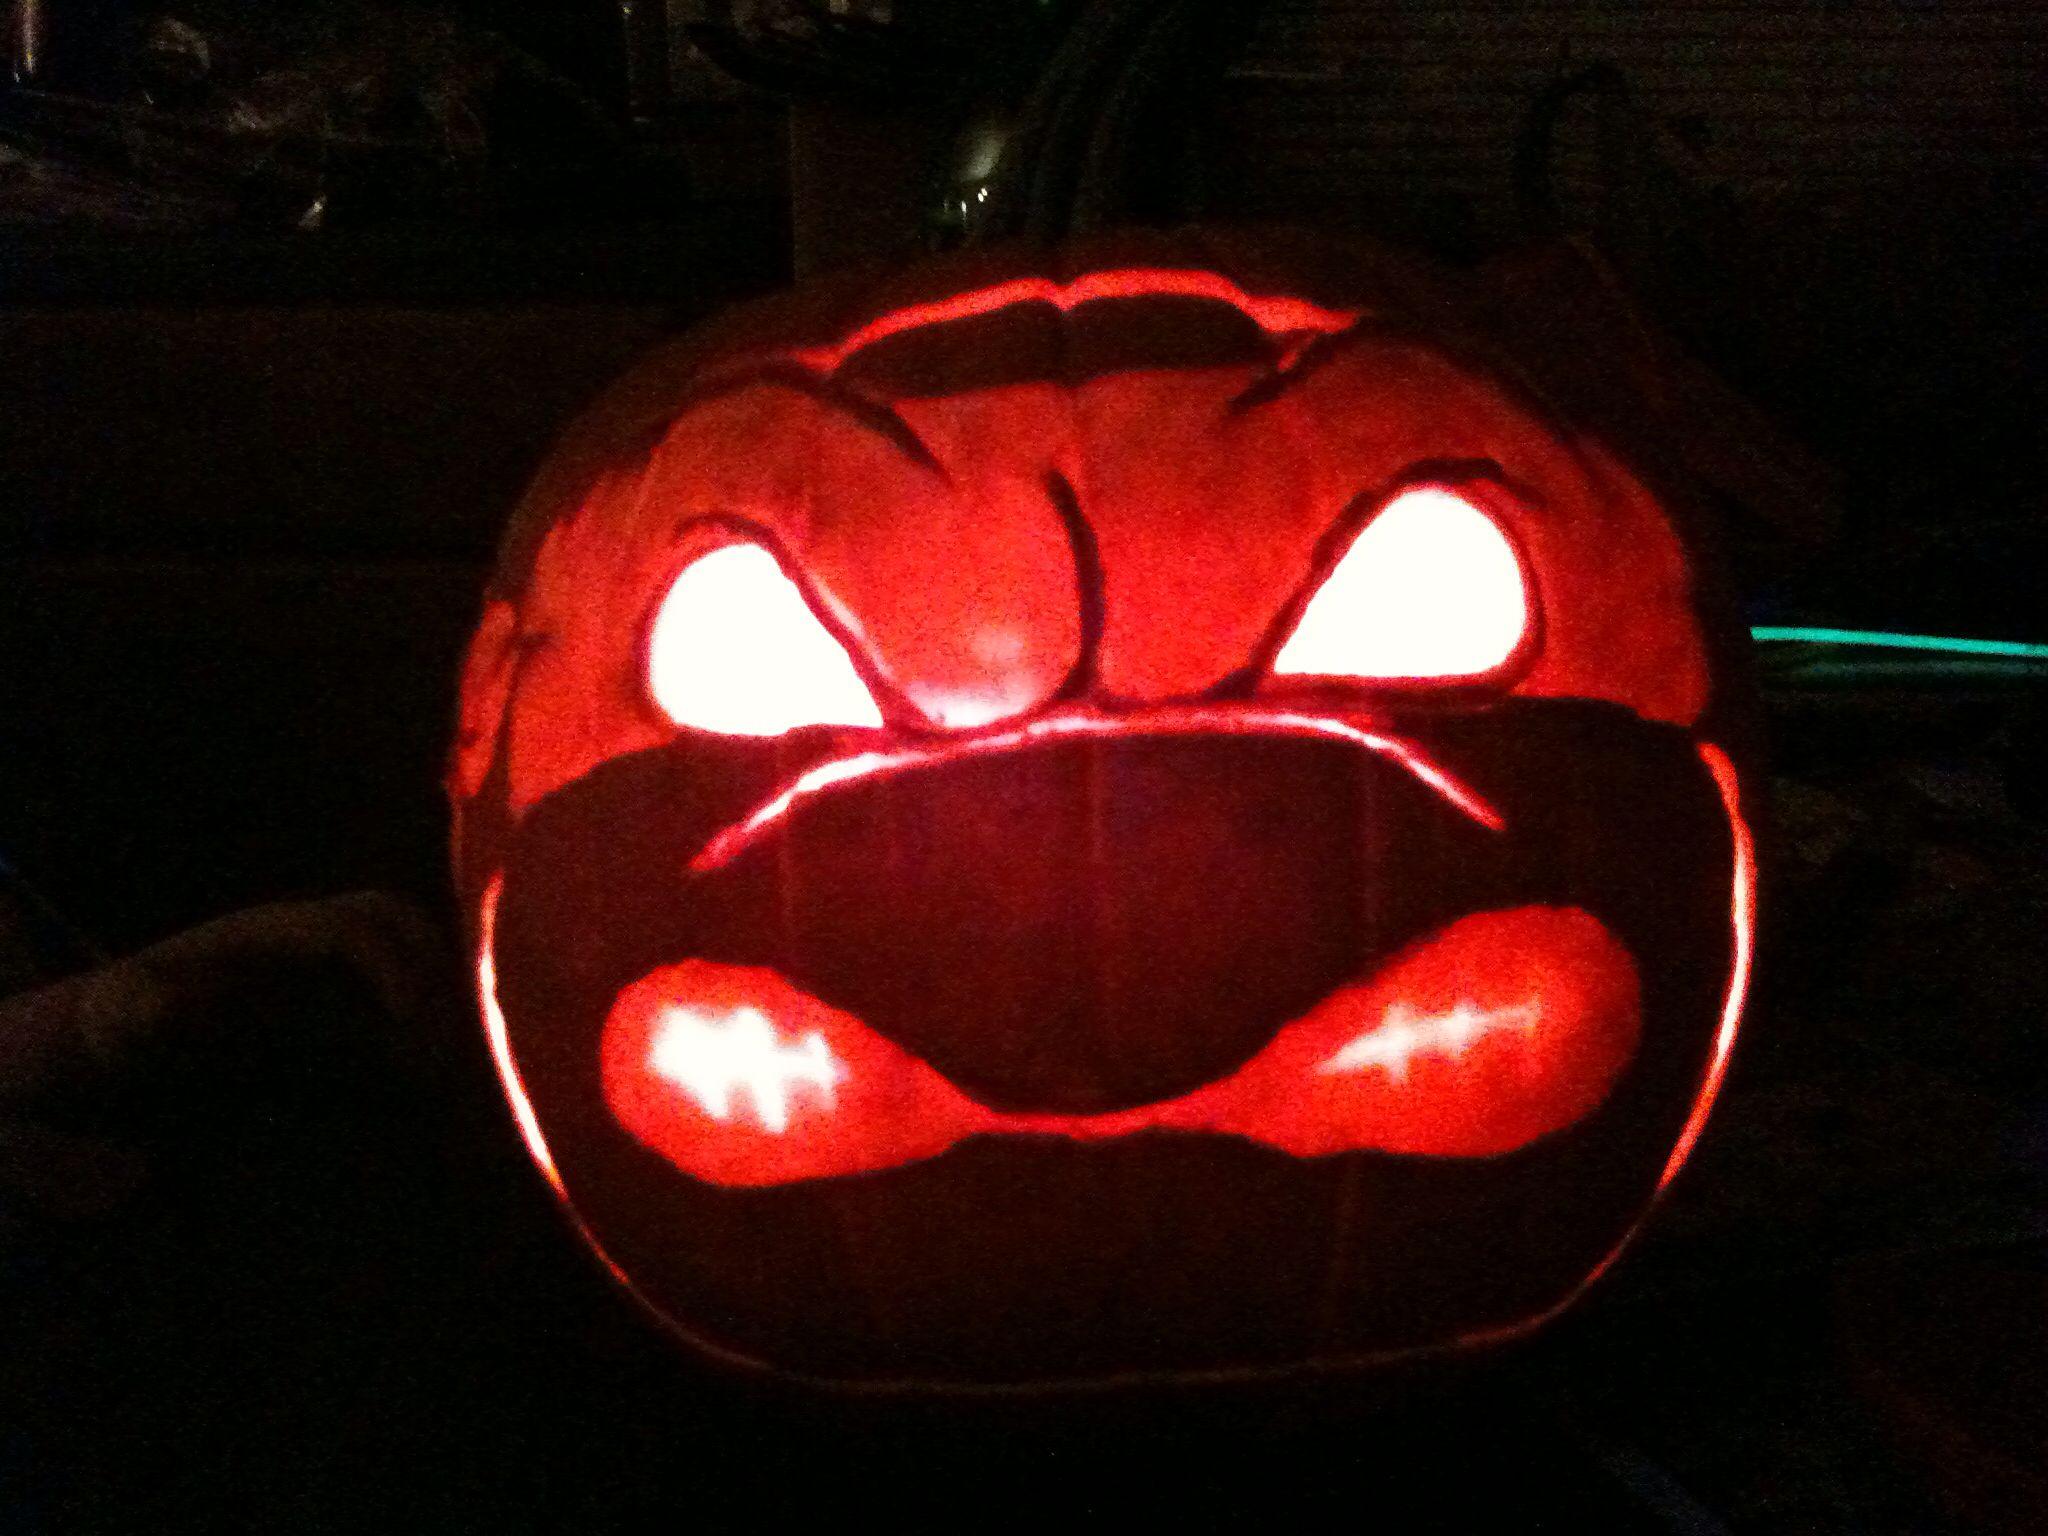 Tmnt Ninja Turtle Pumpkin 102012 By Kd Aiardo My Artwork